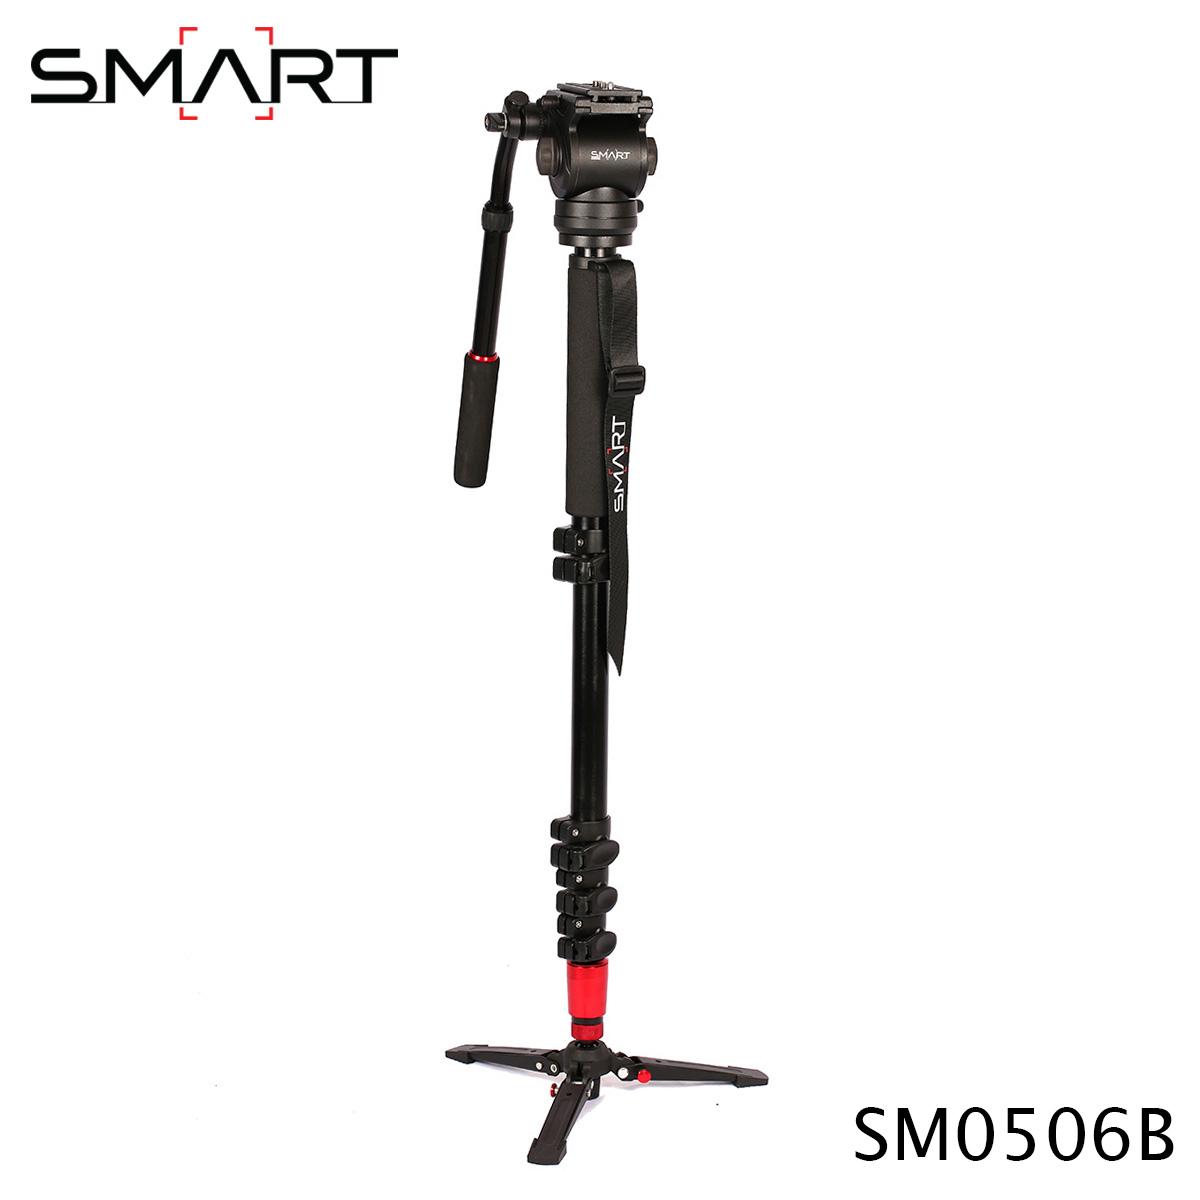 SMART Monopod SM0506B Aluminum Alloy Professional Monopod For Video & Camera